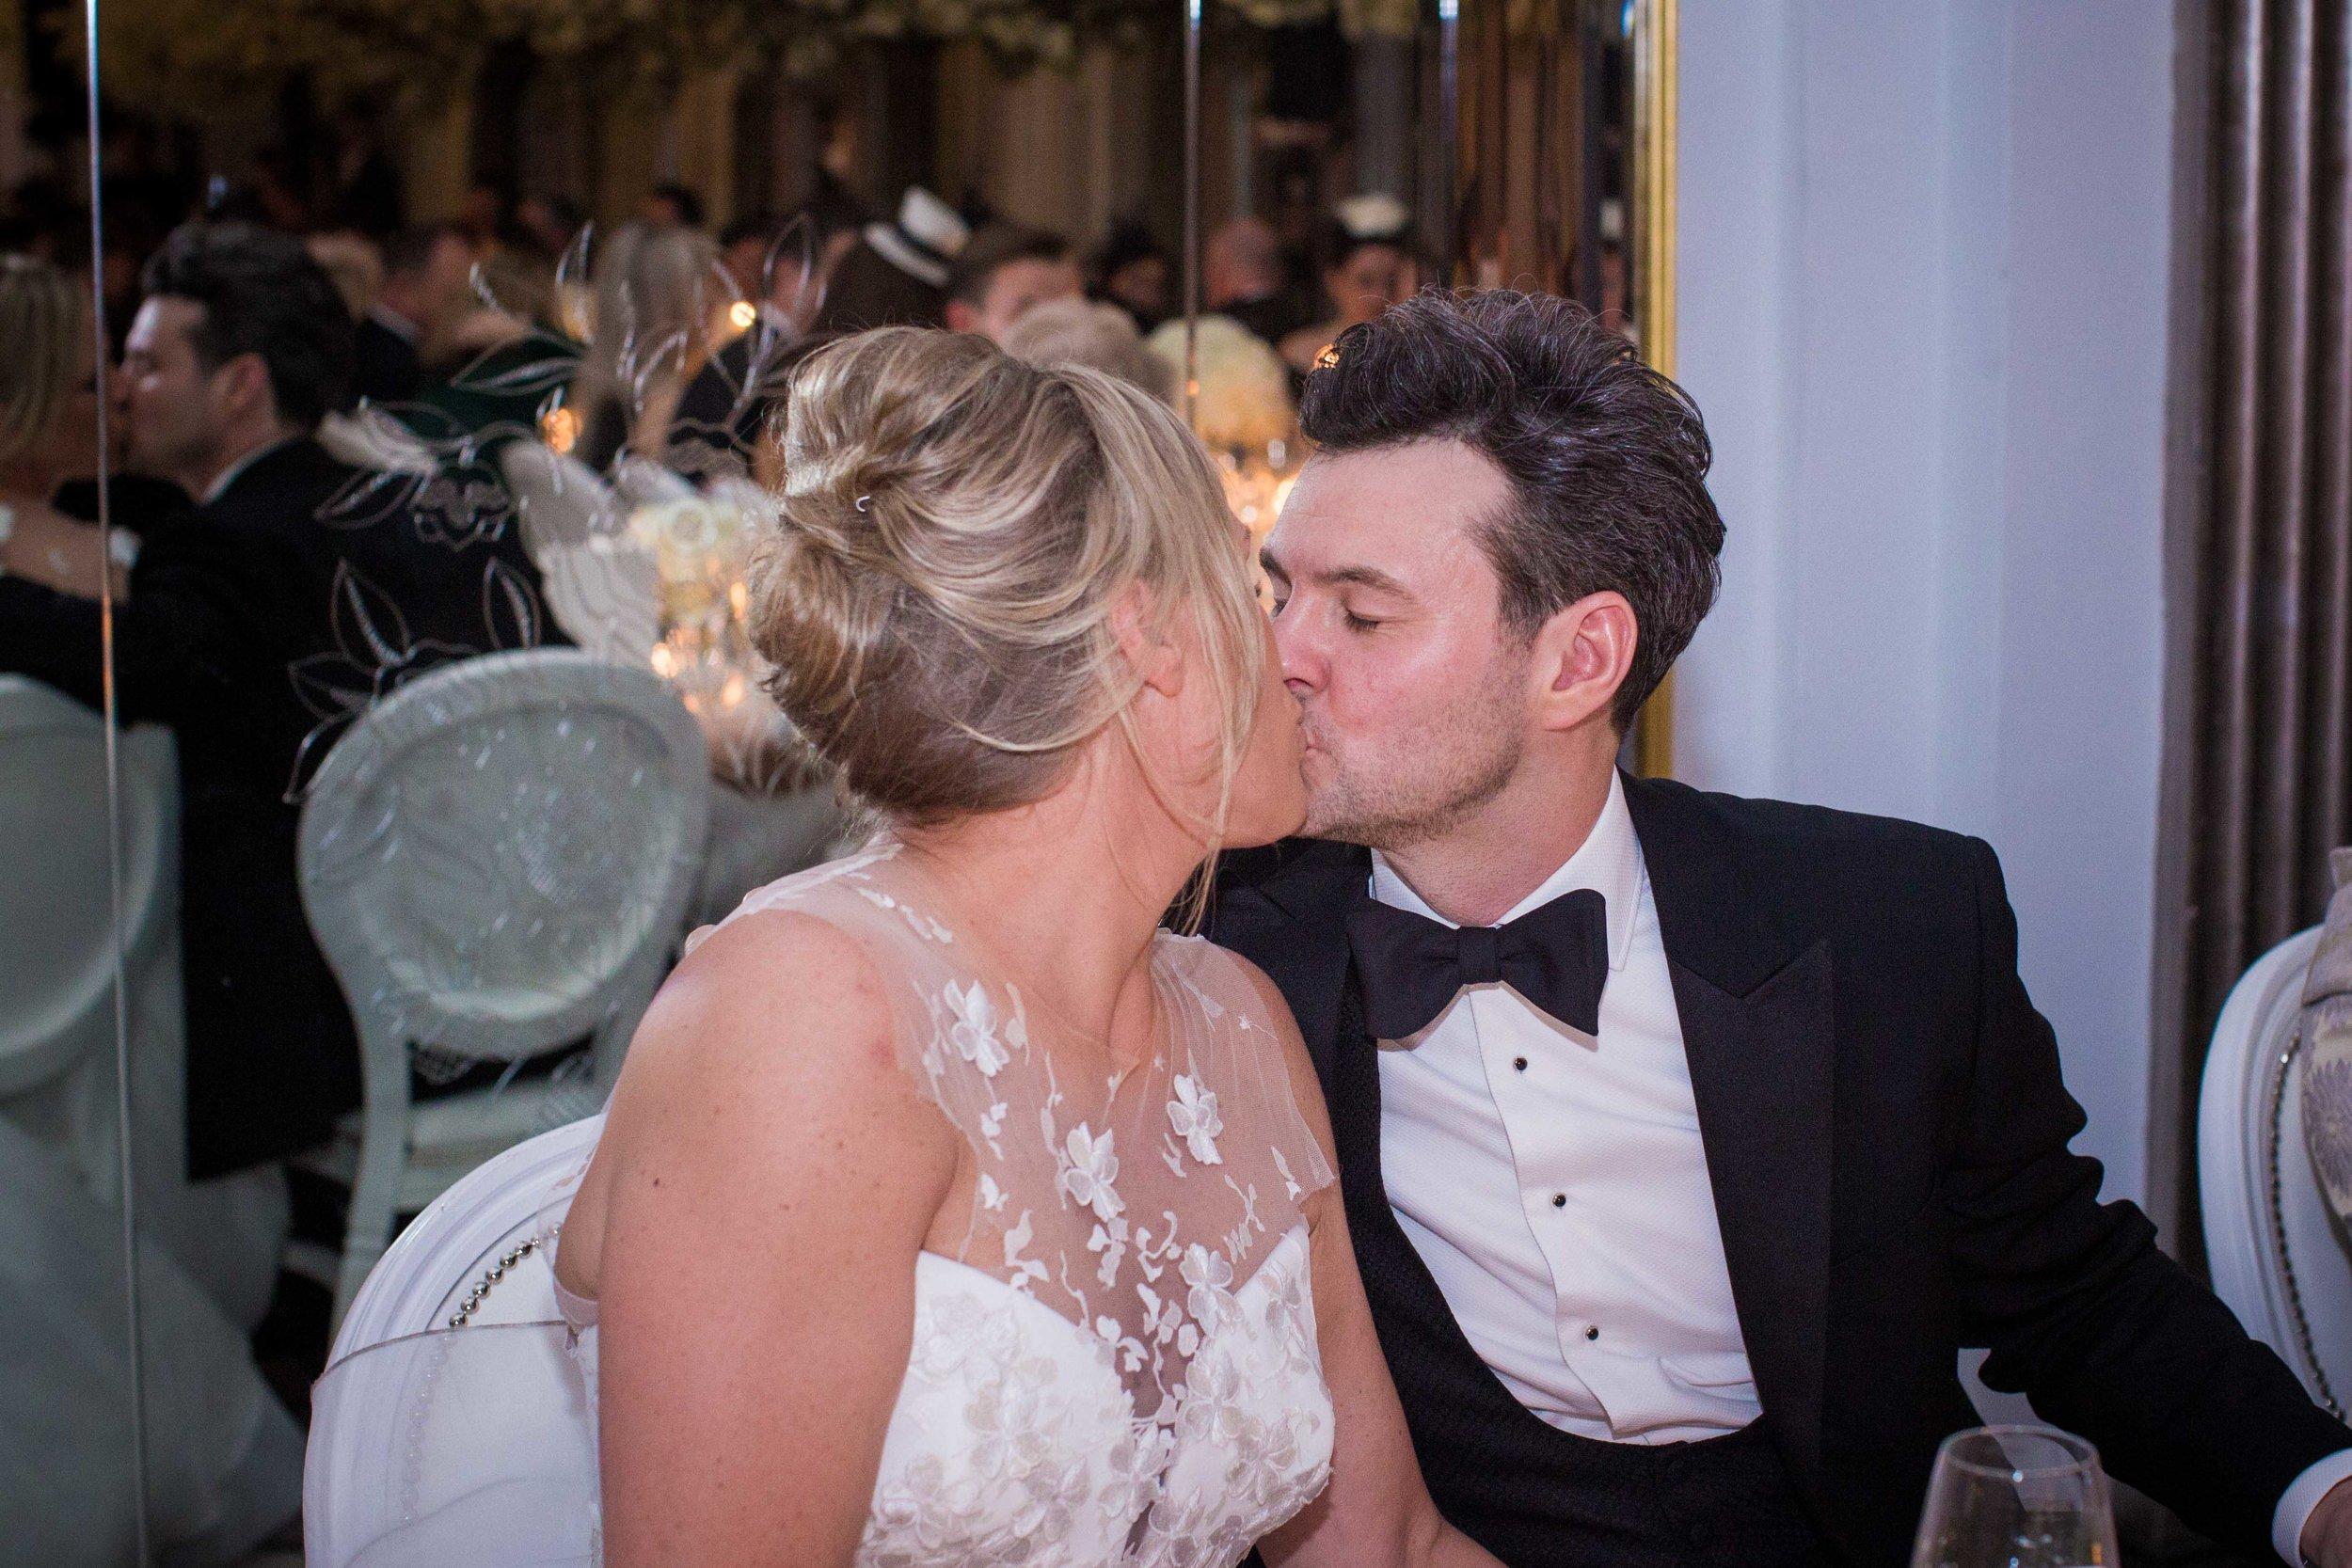 claridges-hotel-wedding-photographer-london-mayfair-natalia-smith-photography-110.jpg